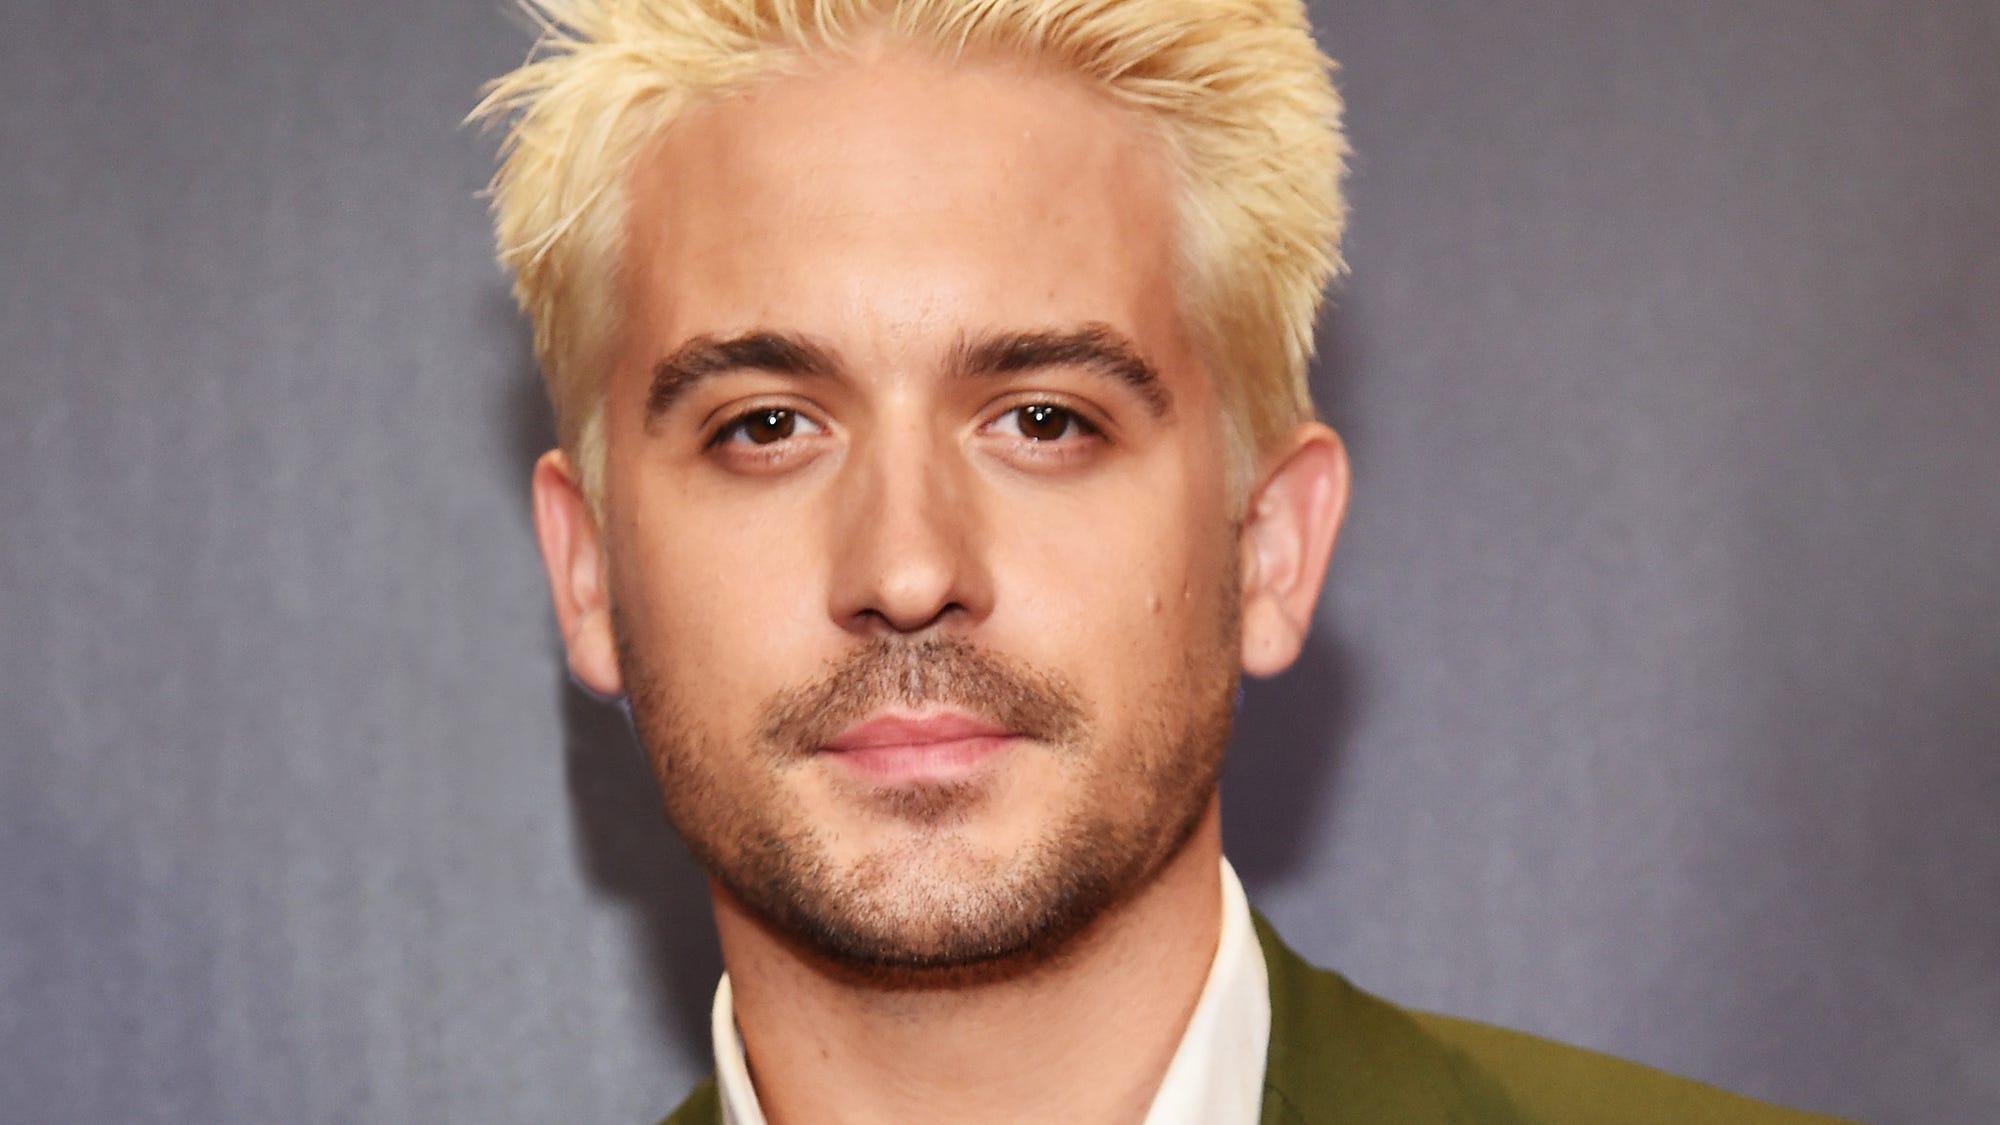 Platinum Blonde Hair Is Trending For Men In Hollywood